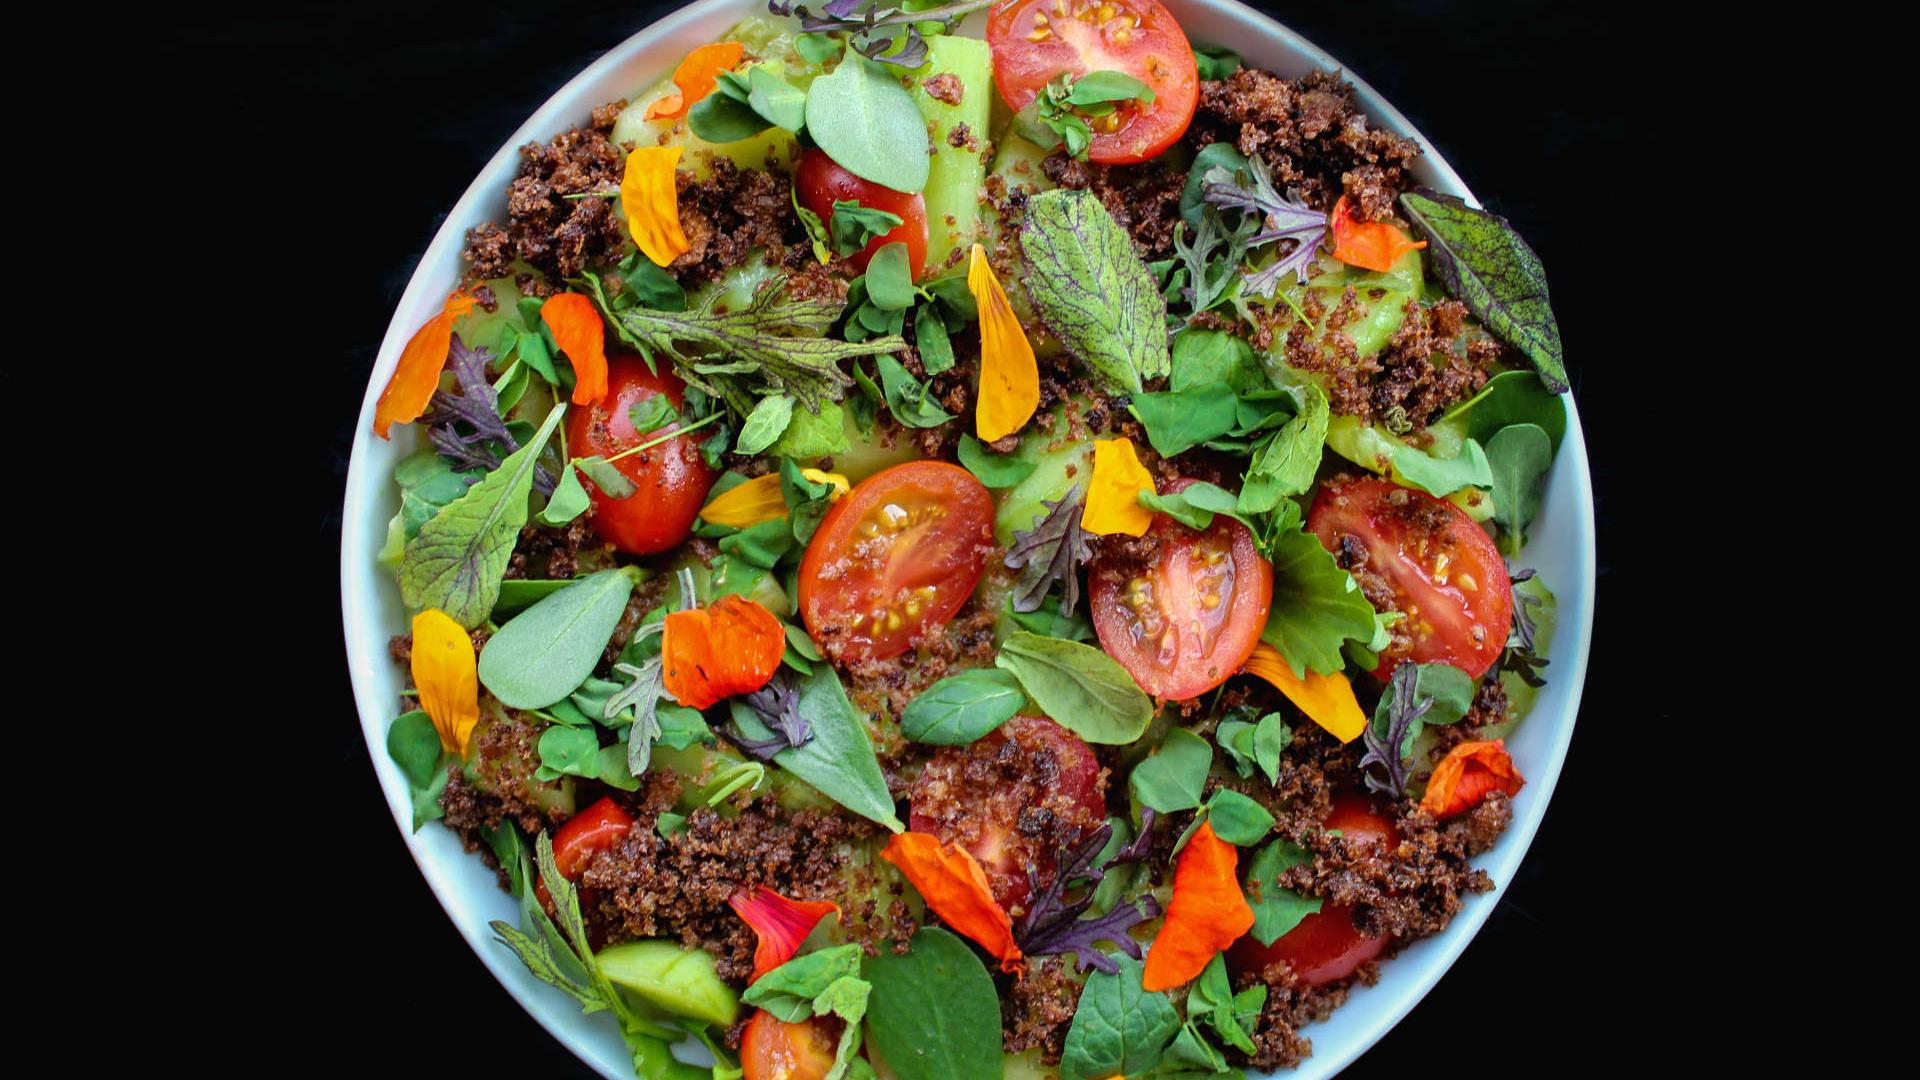 make-this-omaws-cucumber-salad